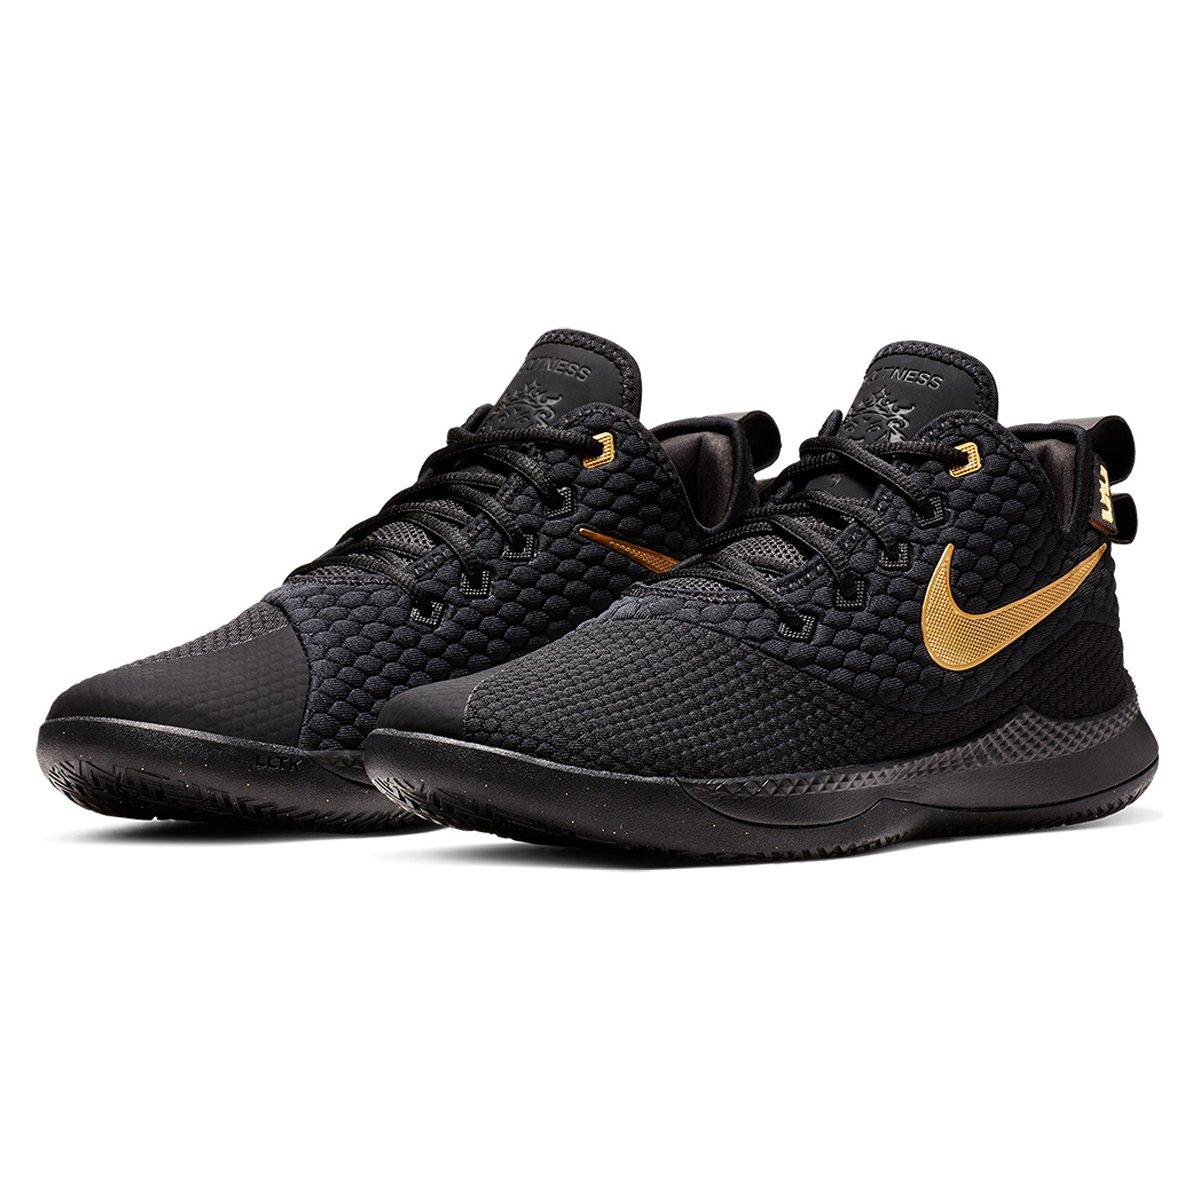 save off 13a07 0cc86 Tênis Nike Lebron Witness III Masculino - Preto e Dourado   Loja NBA